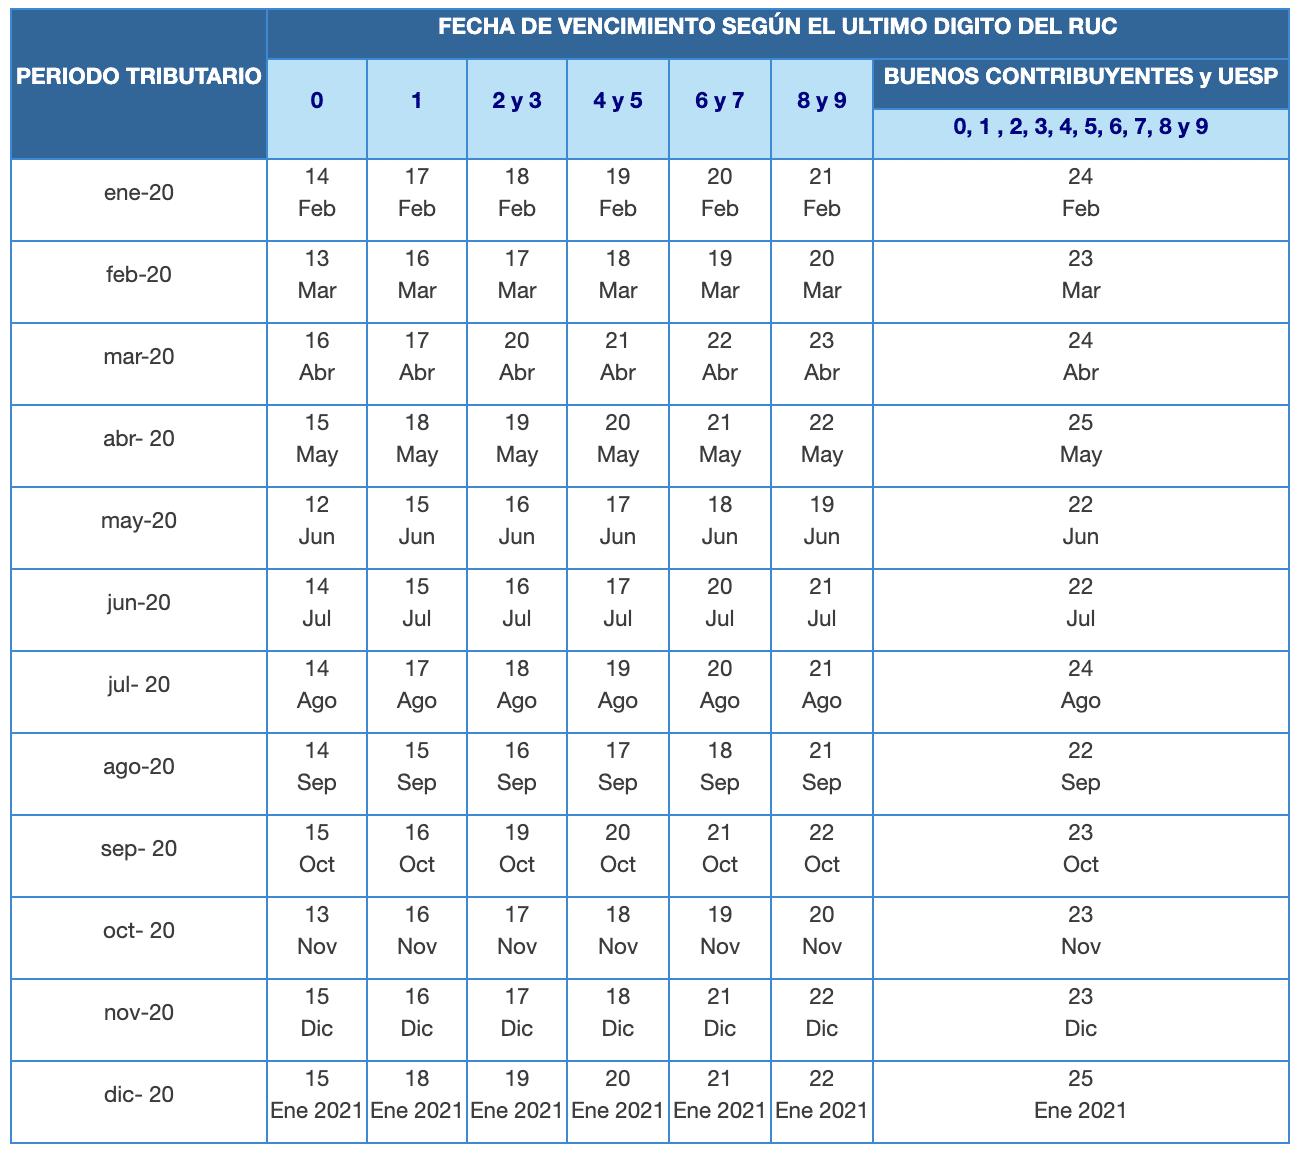 cronograma mensual Nuevo Rus 2020